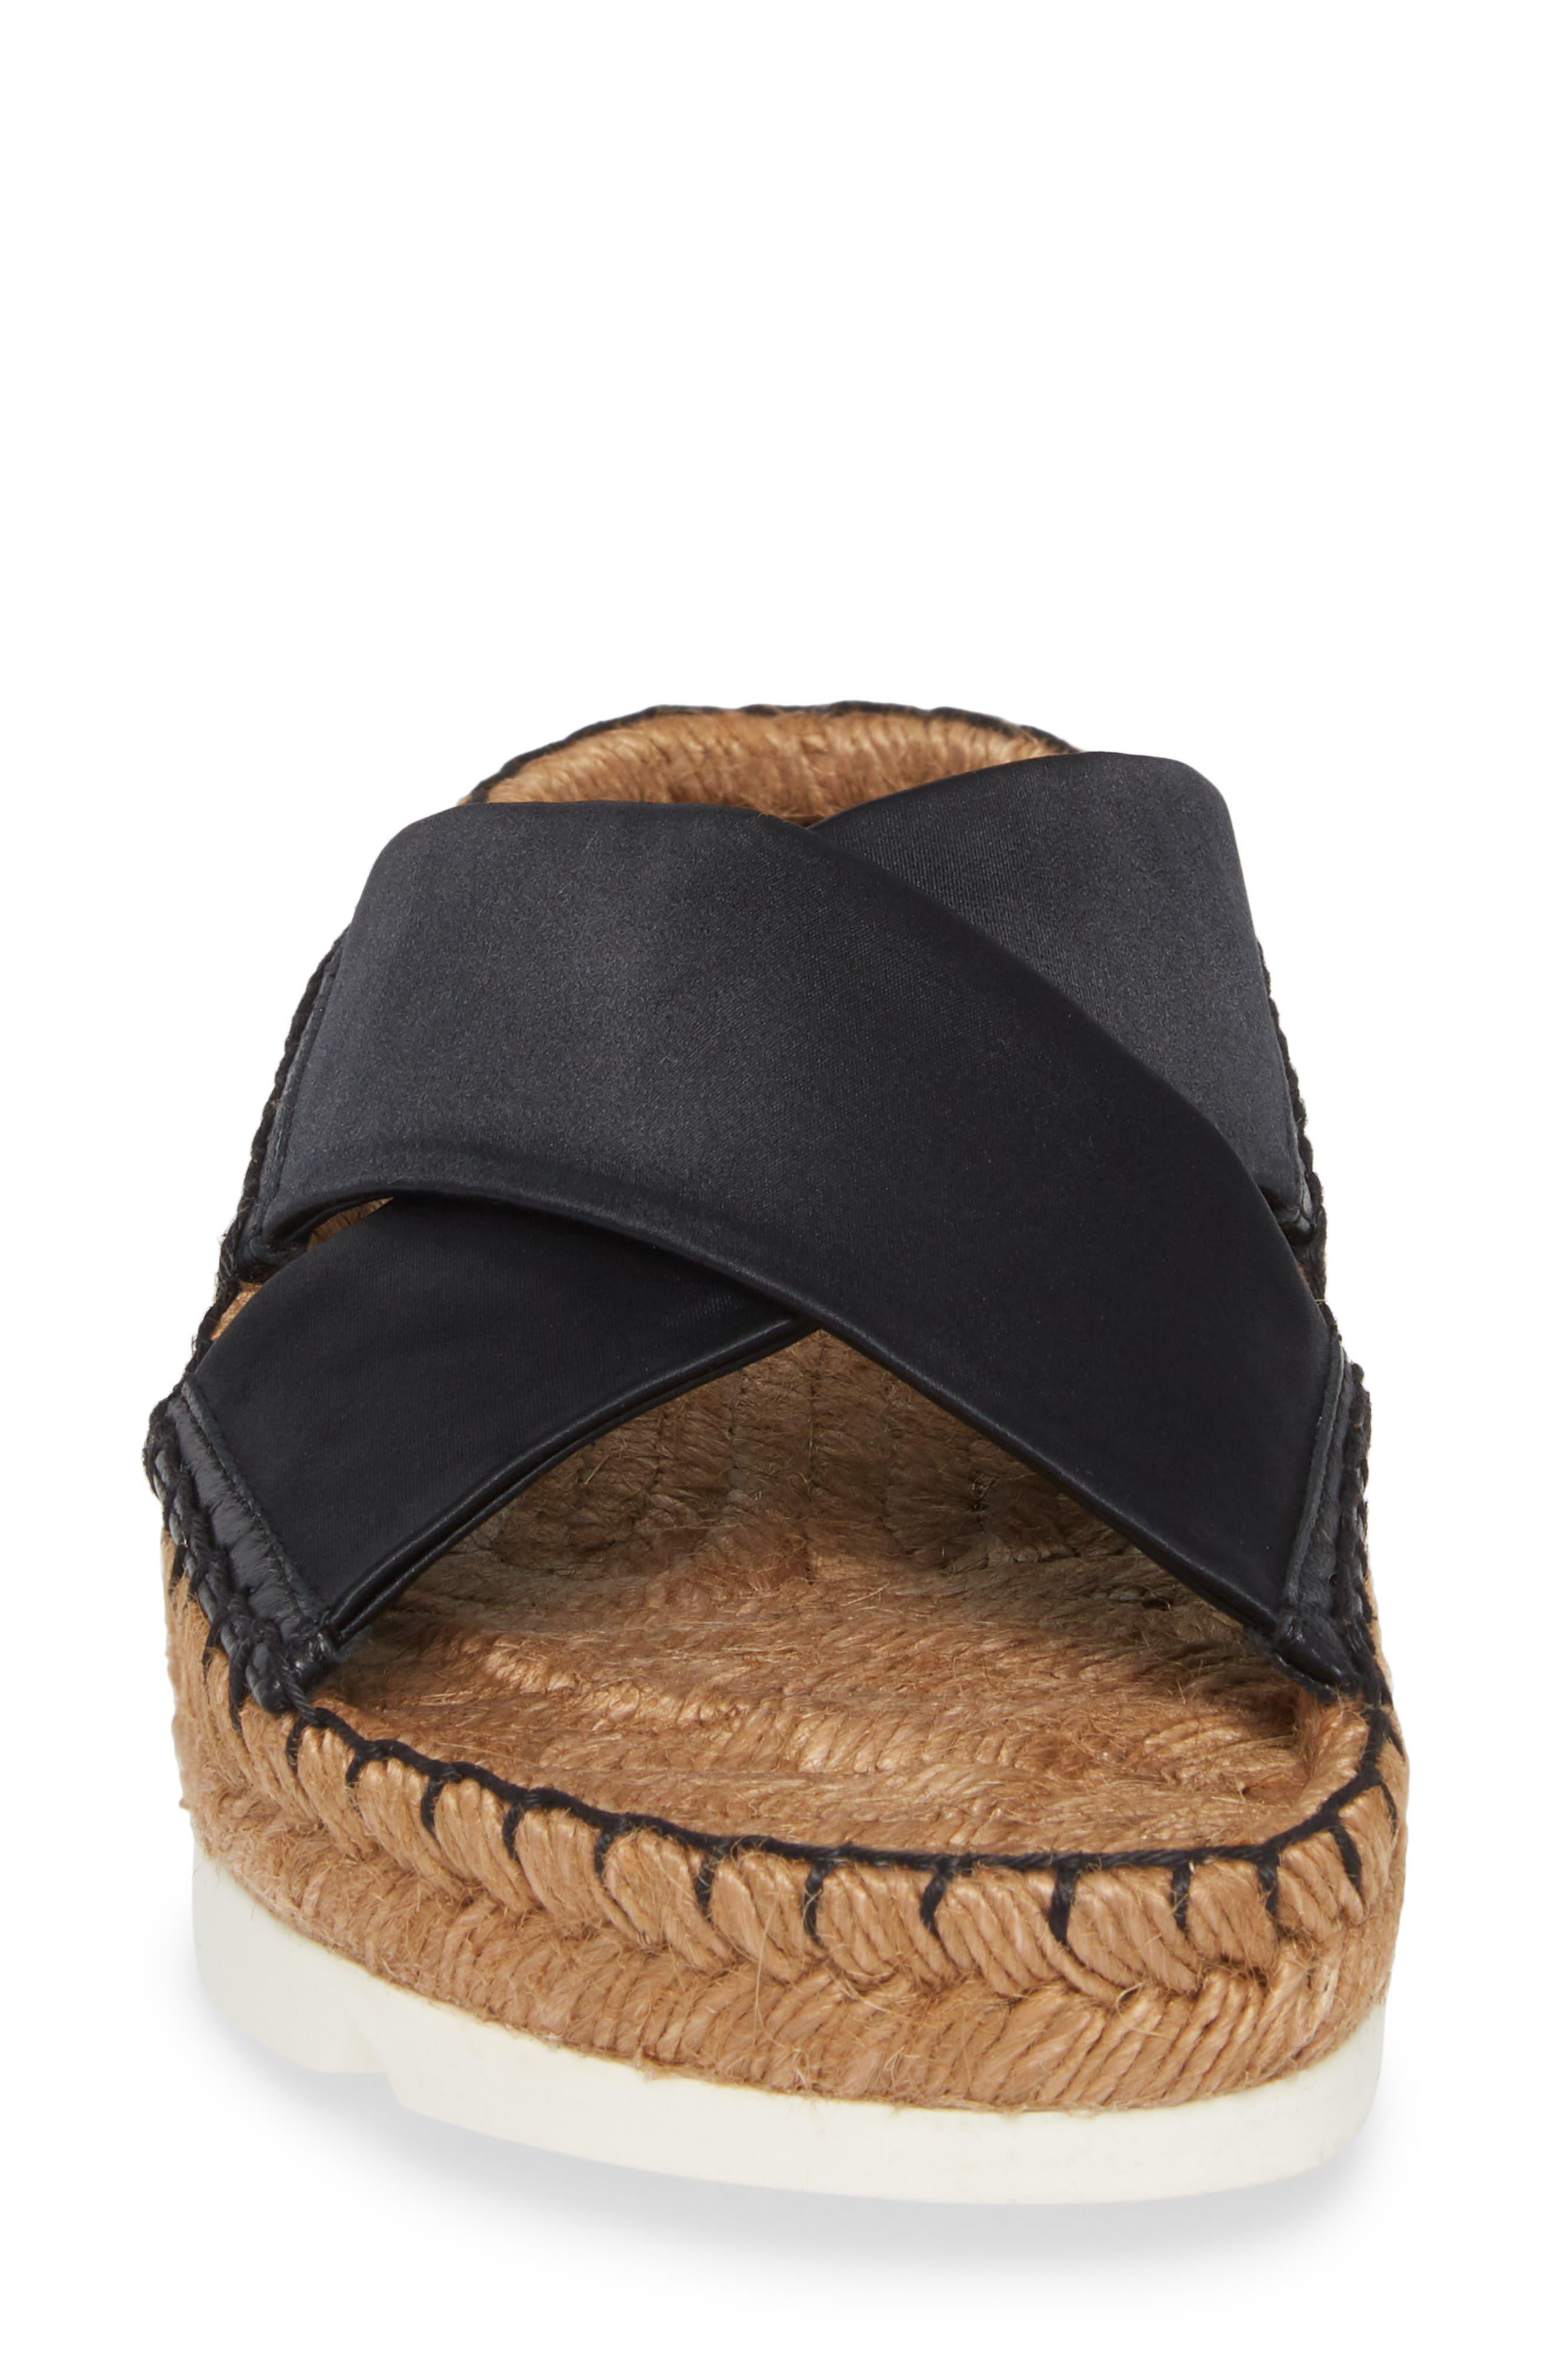 Danae Double Strap Espadrille Slide Sandal,                             Alternate thumbnail 4, color,                             Black